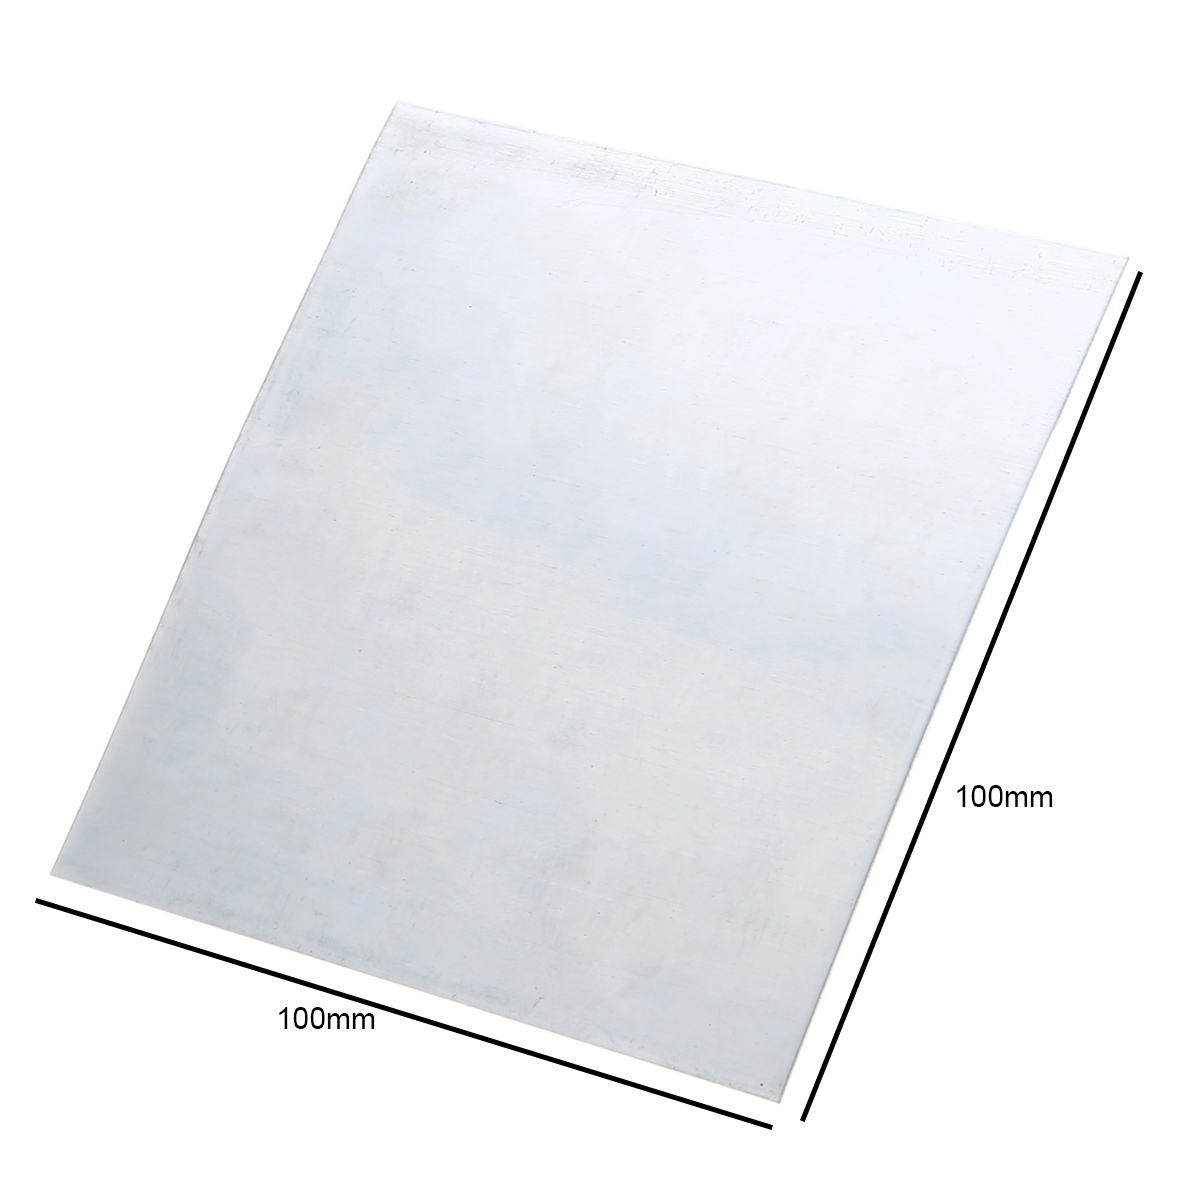 5pcs Pratical Pure Zinc Zn Sheet Plate Metal Foil 100mmx100mmx0.5mm For Science Lab Accessories 1sheet matte surface 3k 100% carbon fiber plate sheet 2mm thickness